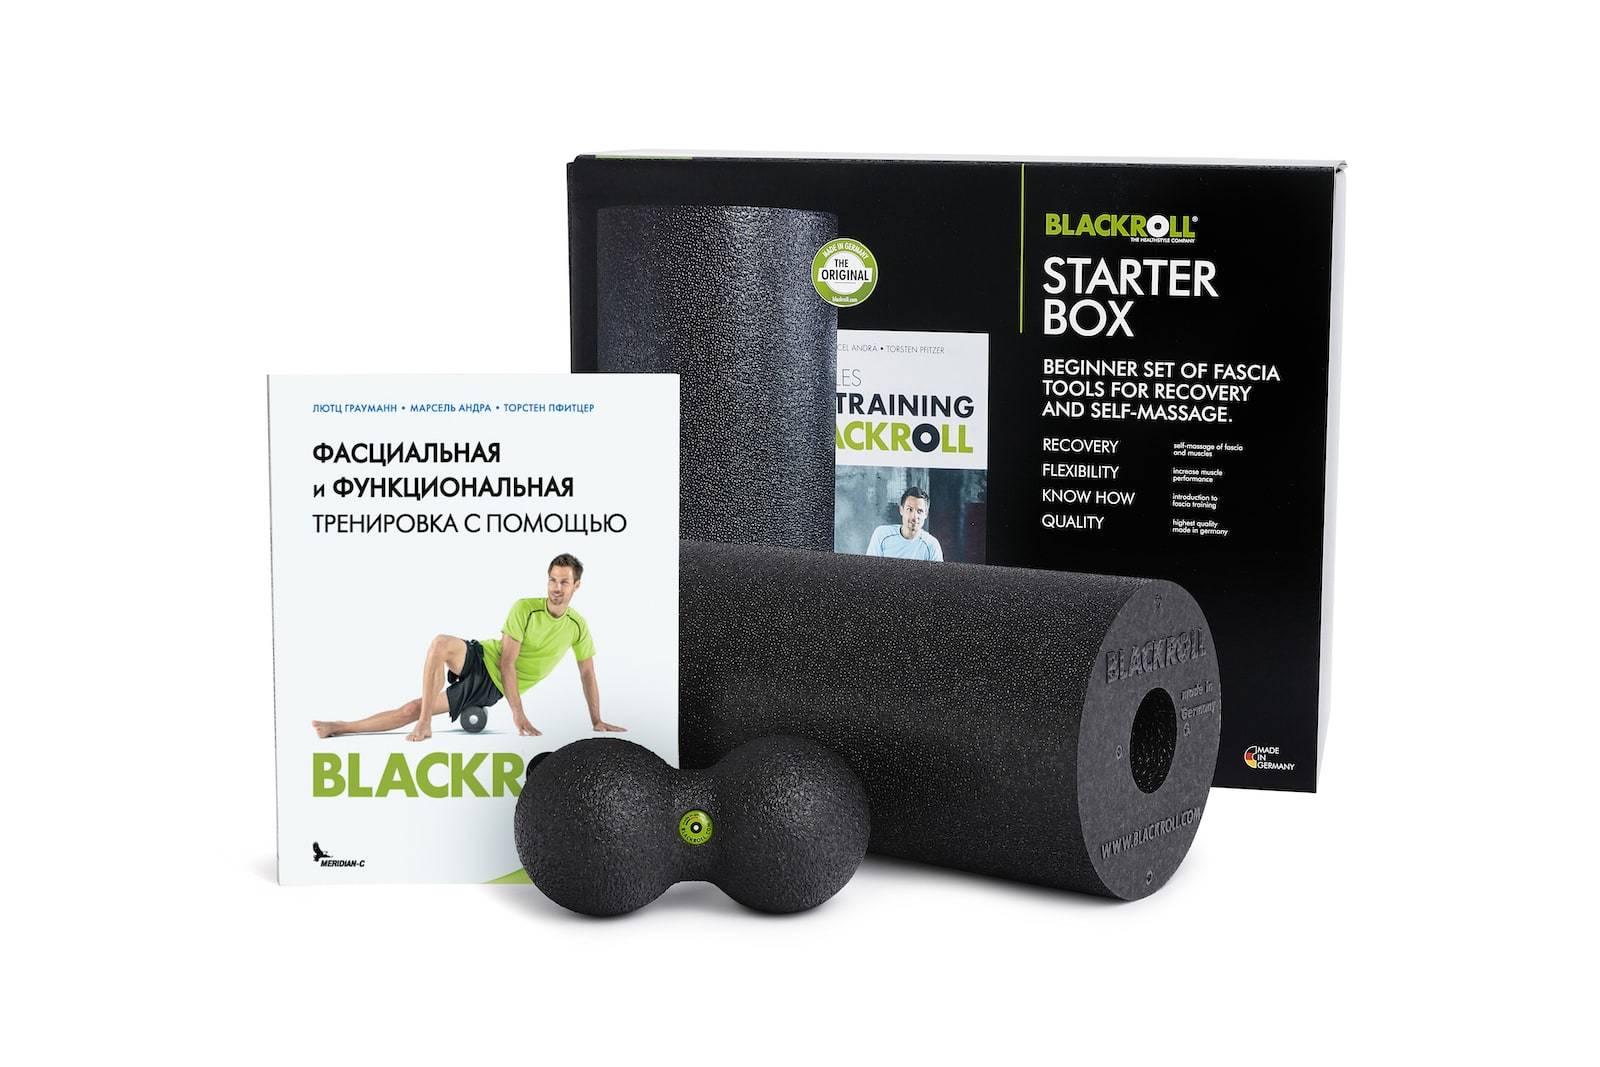 Массажные наборы BLACKROLL® Массажный набор BLACKROLL® STARTER BOX BR_2020-04_STARTER-BOX_01498_WEB_RU.jpg